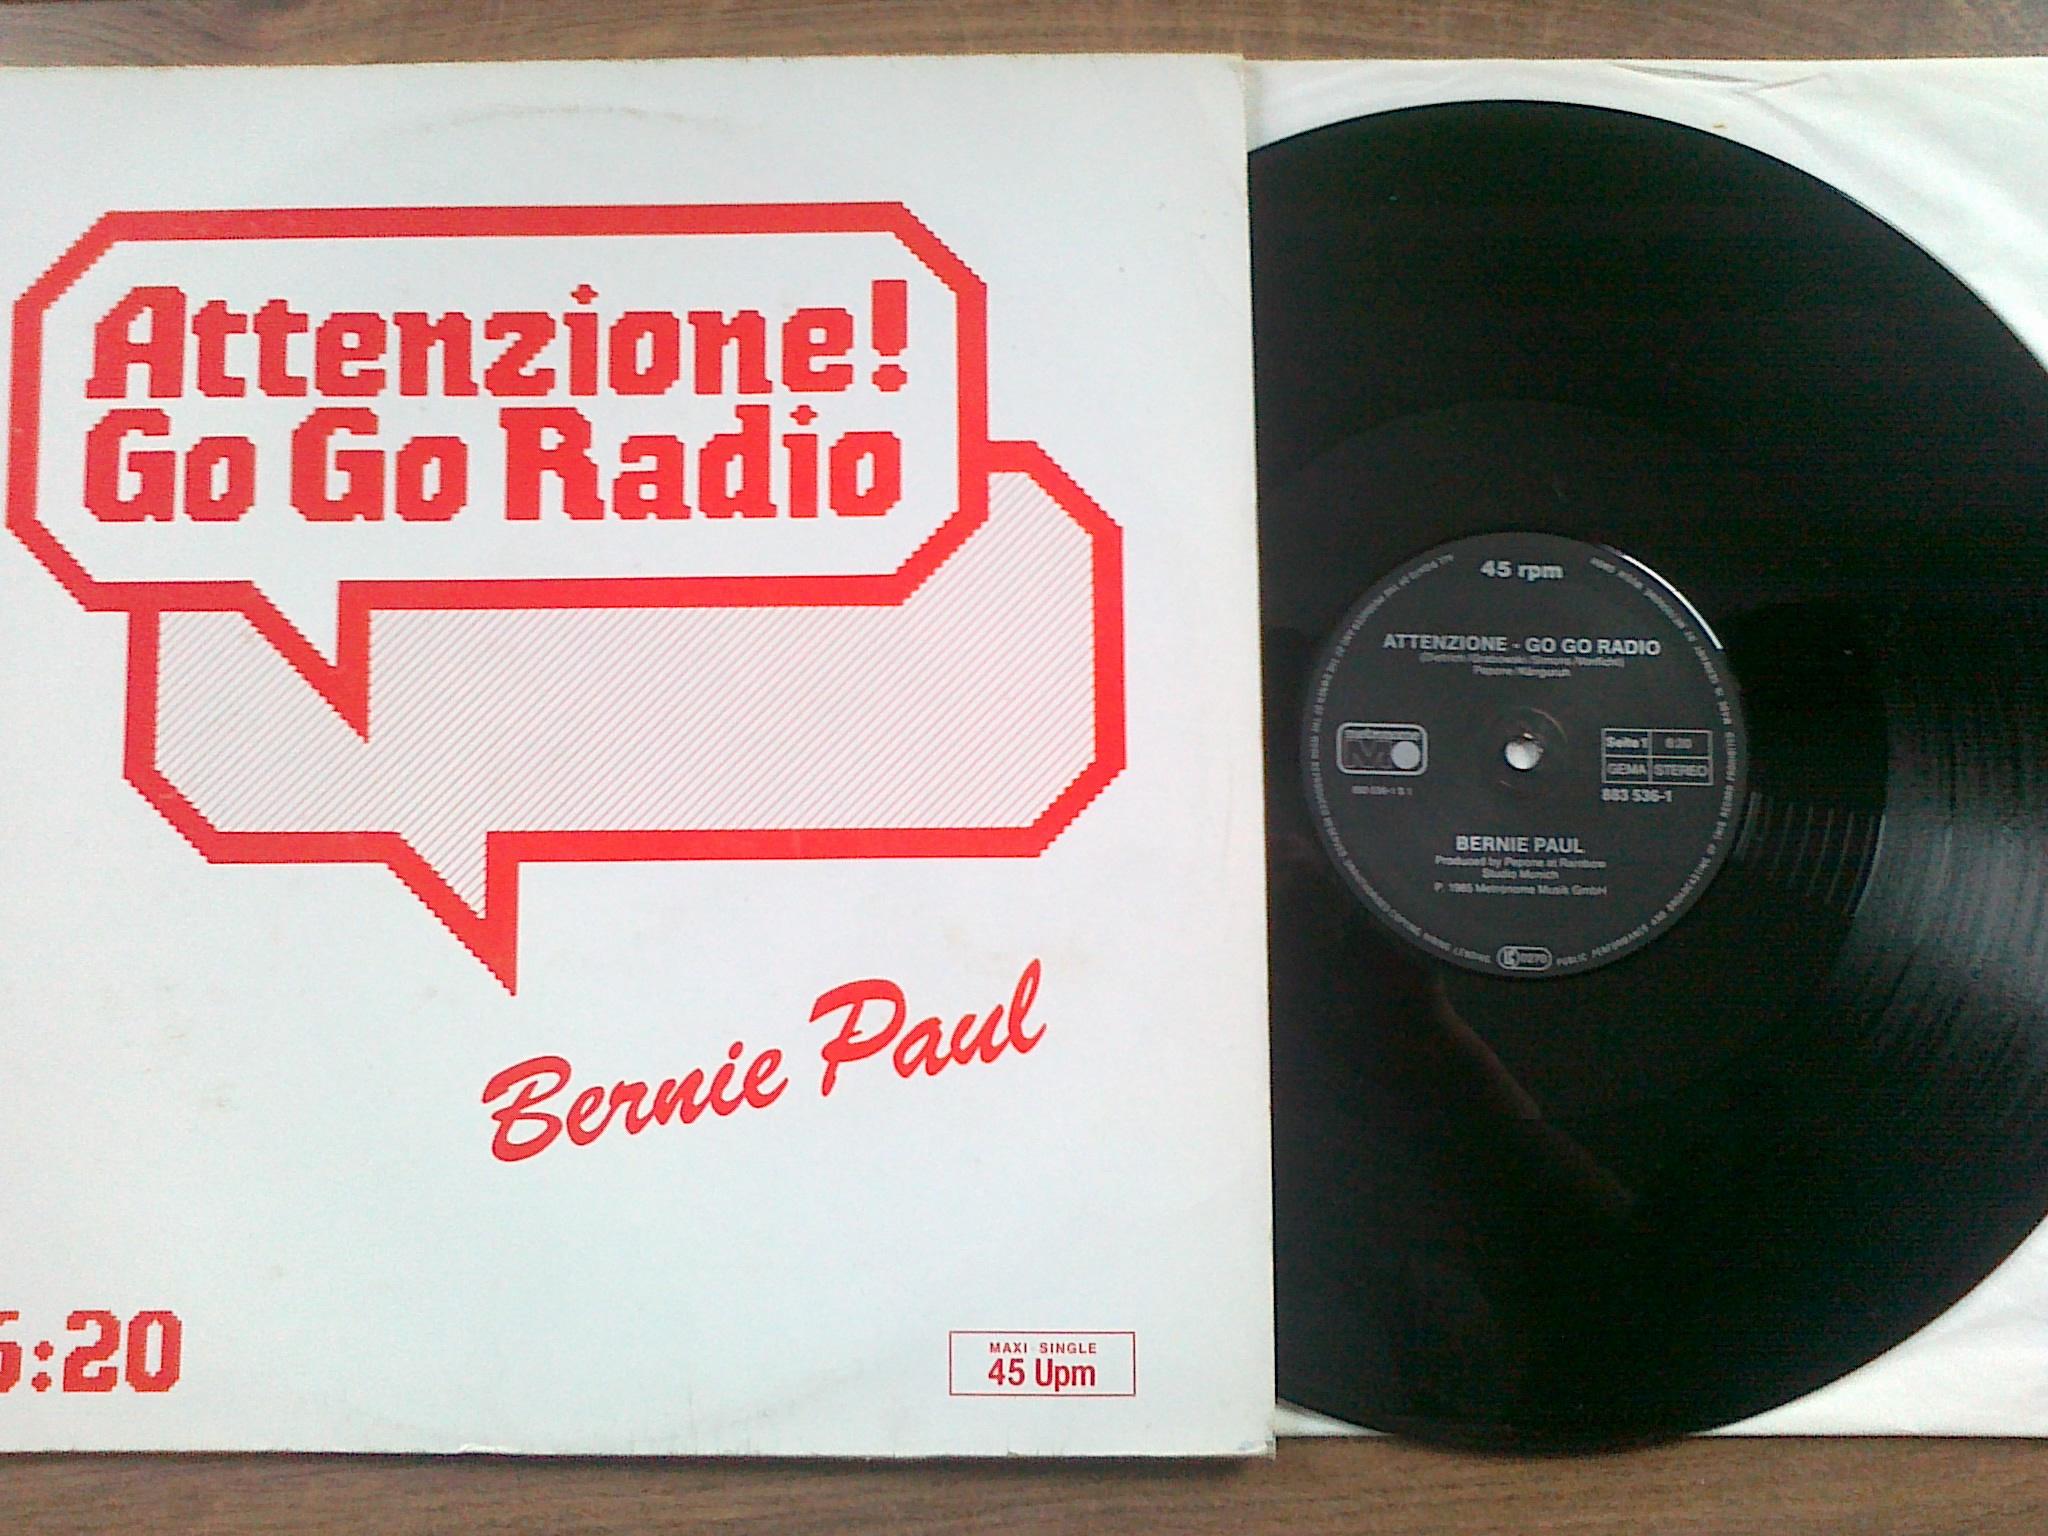 Bernie Paul - Attenzione! Go Go Radio